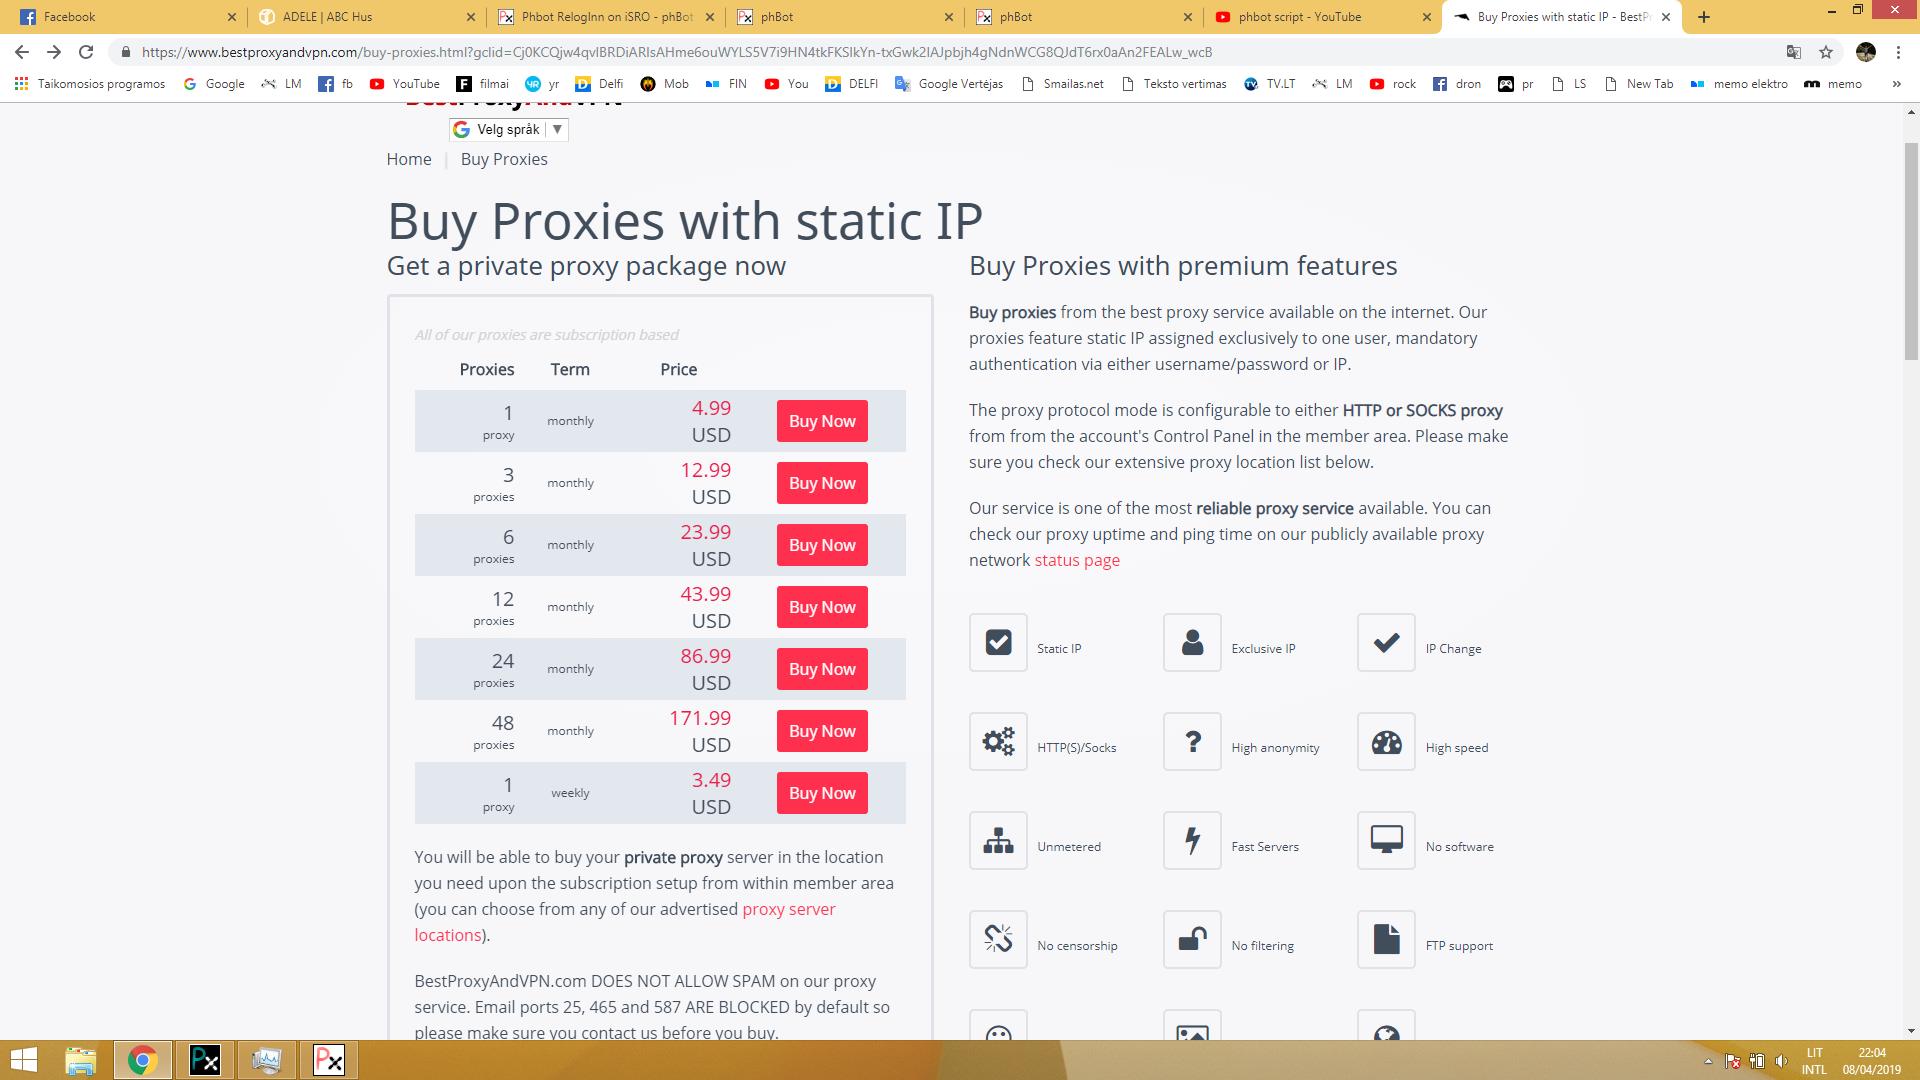 Phbot RelogInn on iSRO - phBot - ProjectHax